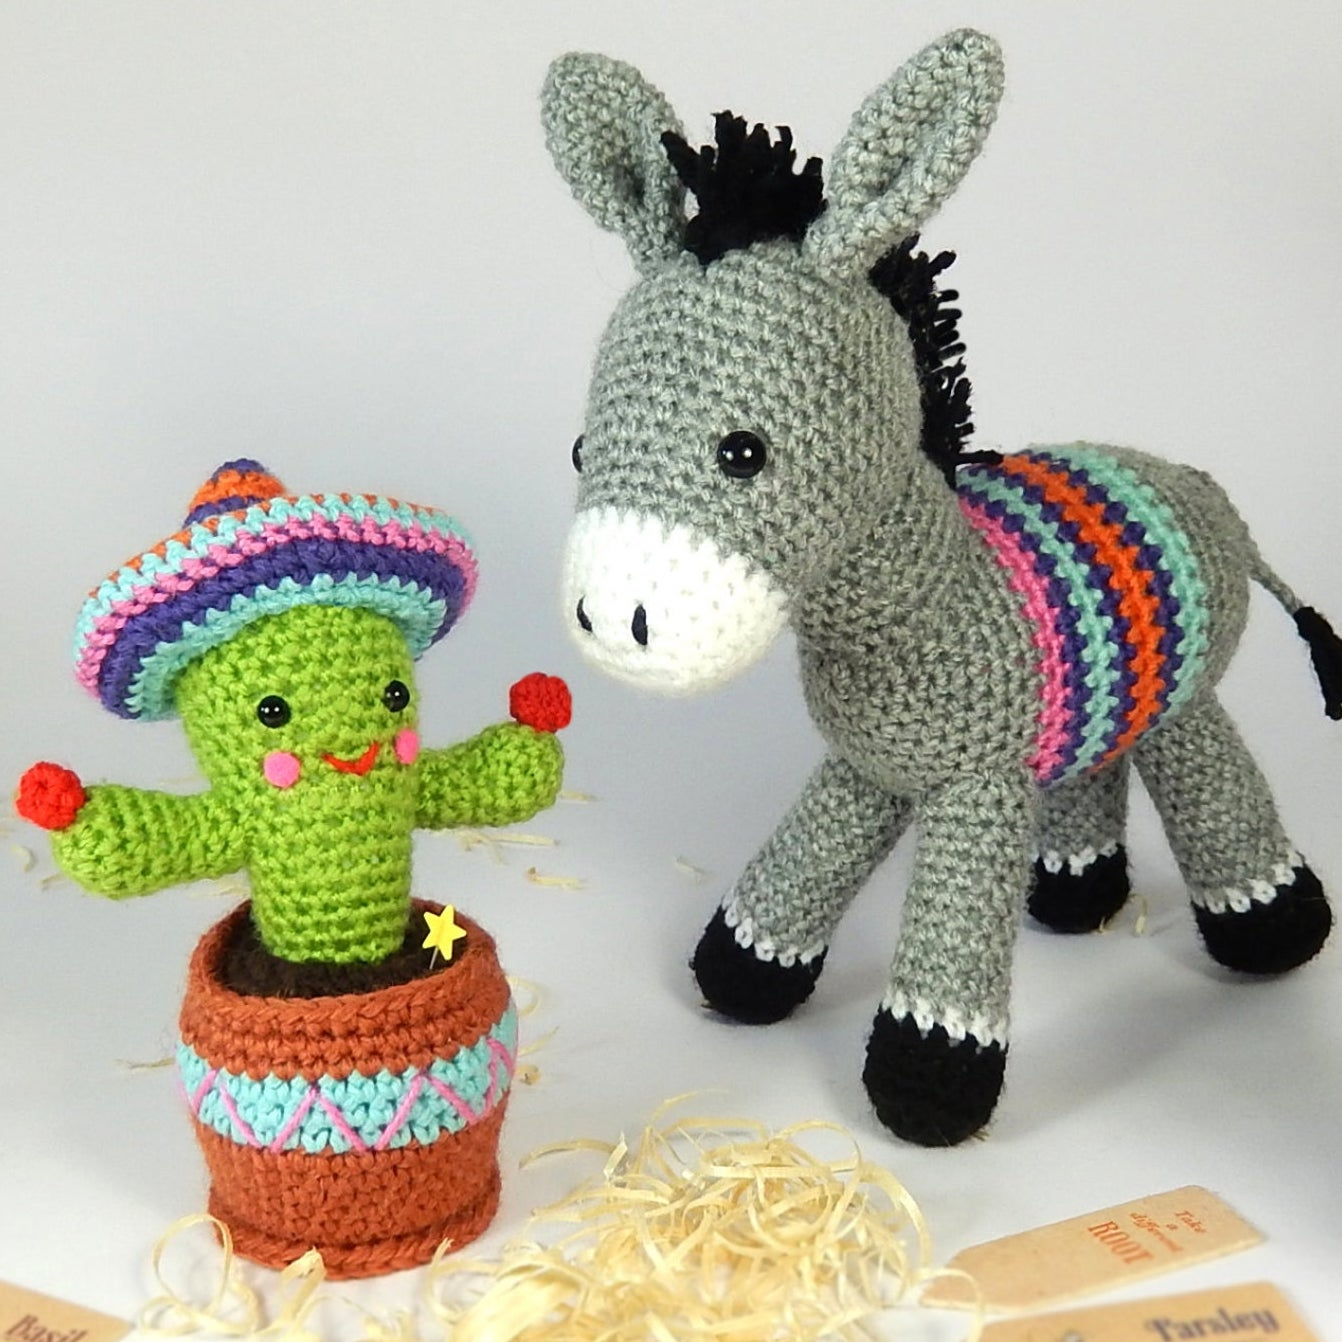 Dante the Donkey and Carlos the Cactus - Amigurumi Crochet Pattern ...   1342x1342